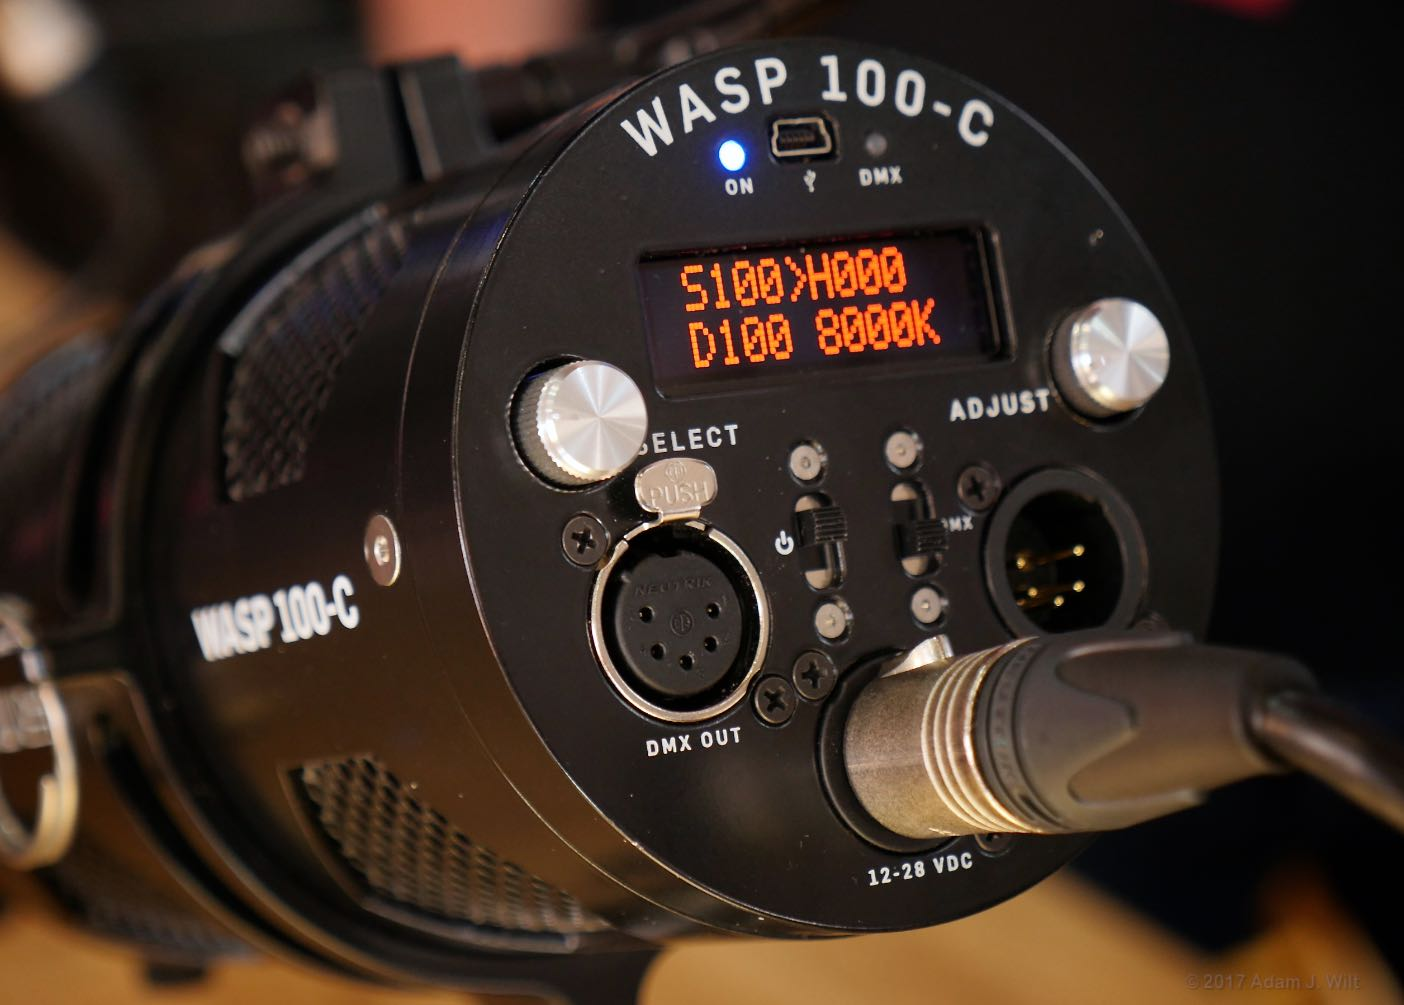 WASP 100-C controls